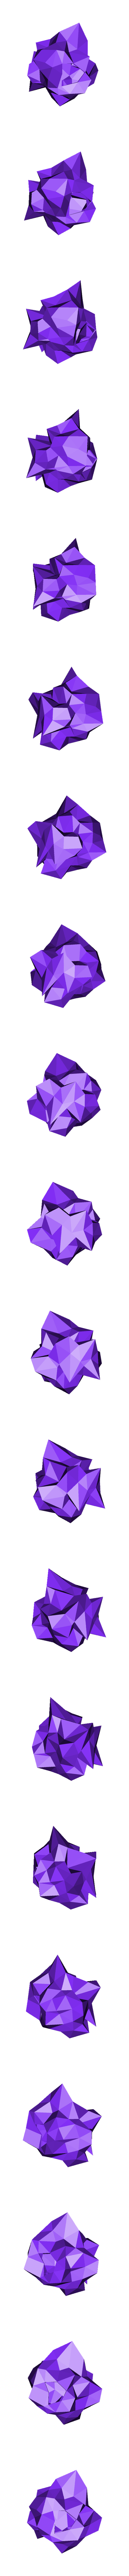 flower_vase_sphere_random.stl Download free STL file Sphere Random Vase • 3D printing design, IDEABOX